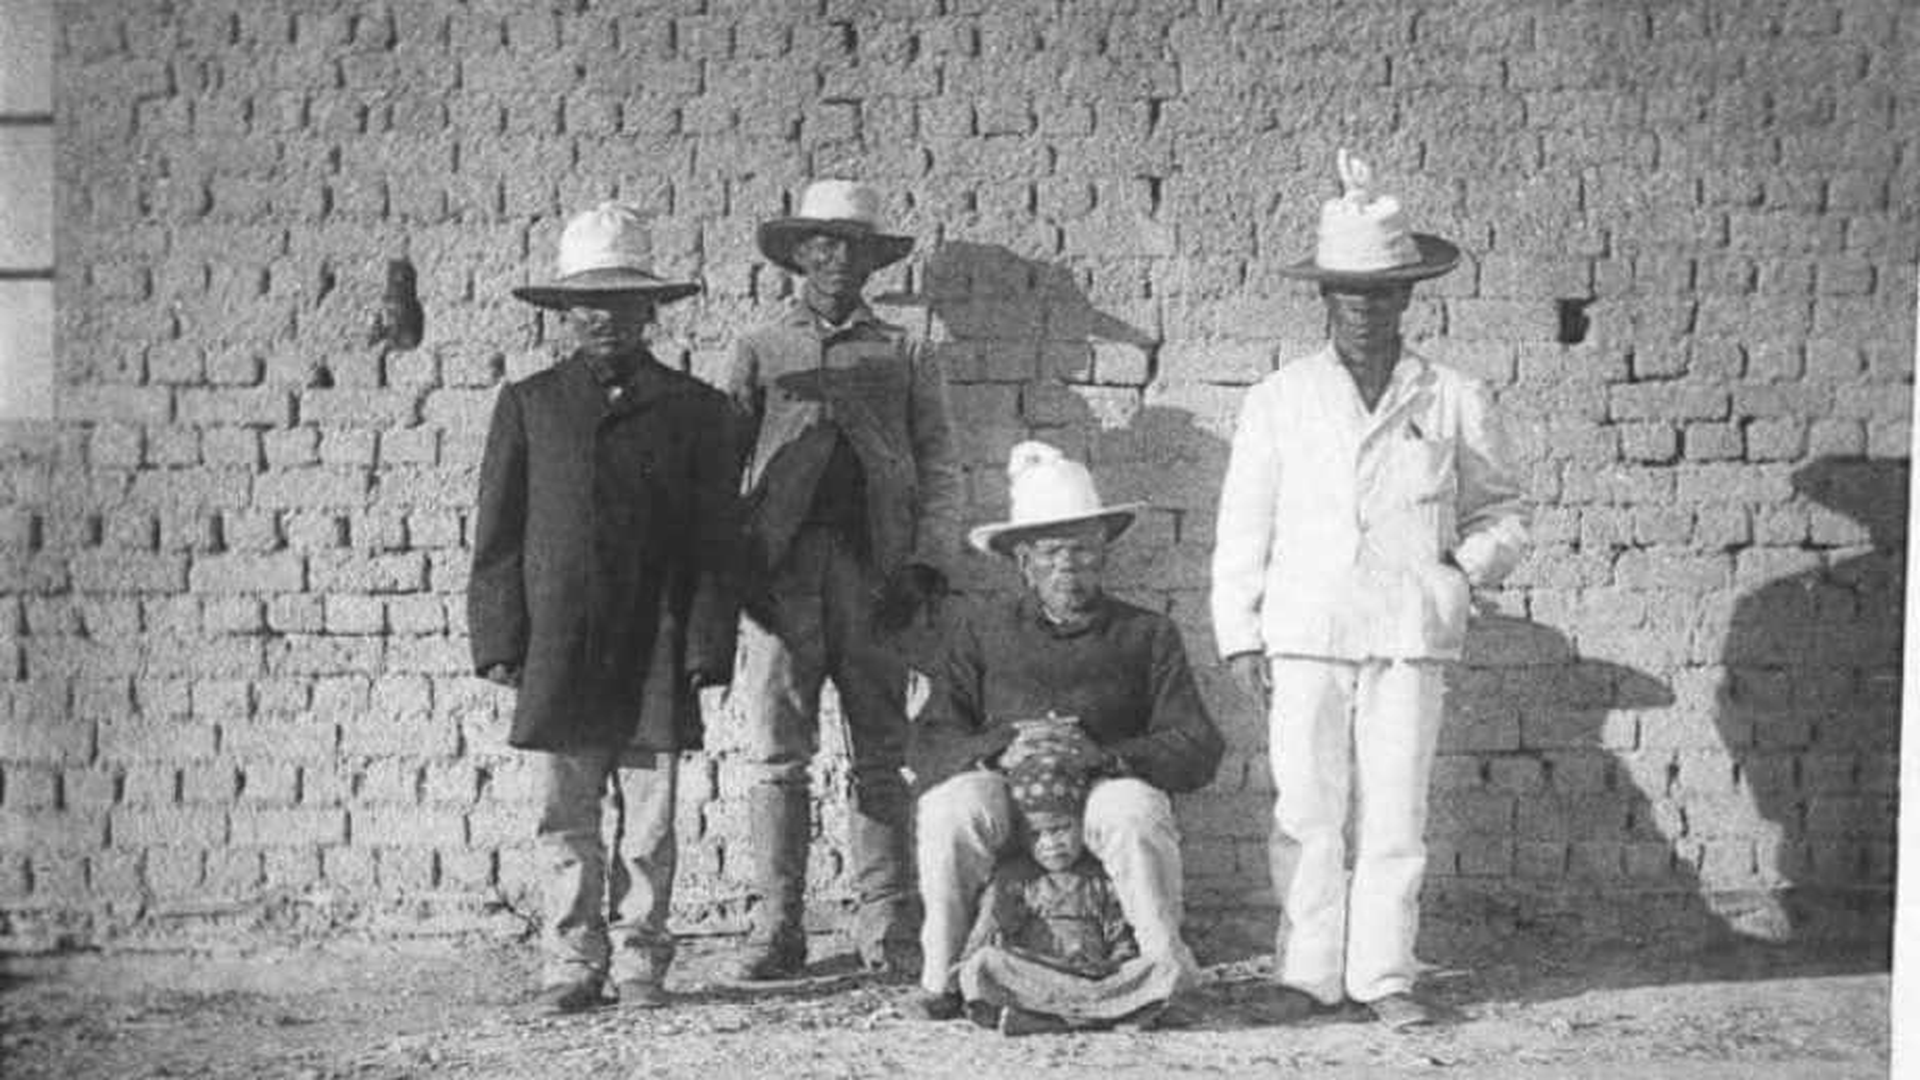 German museum to repatriate artefacts previously belonging to Namibian hero